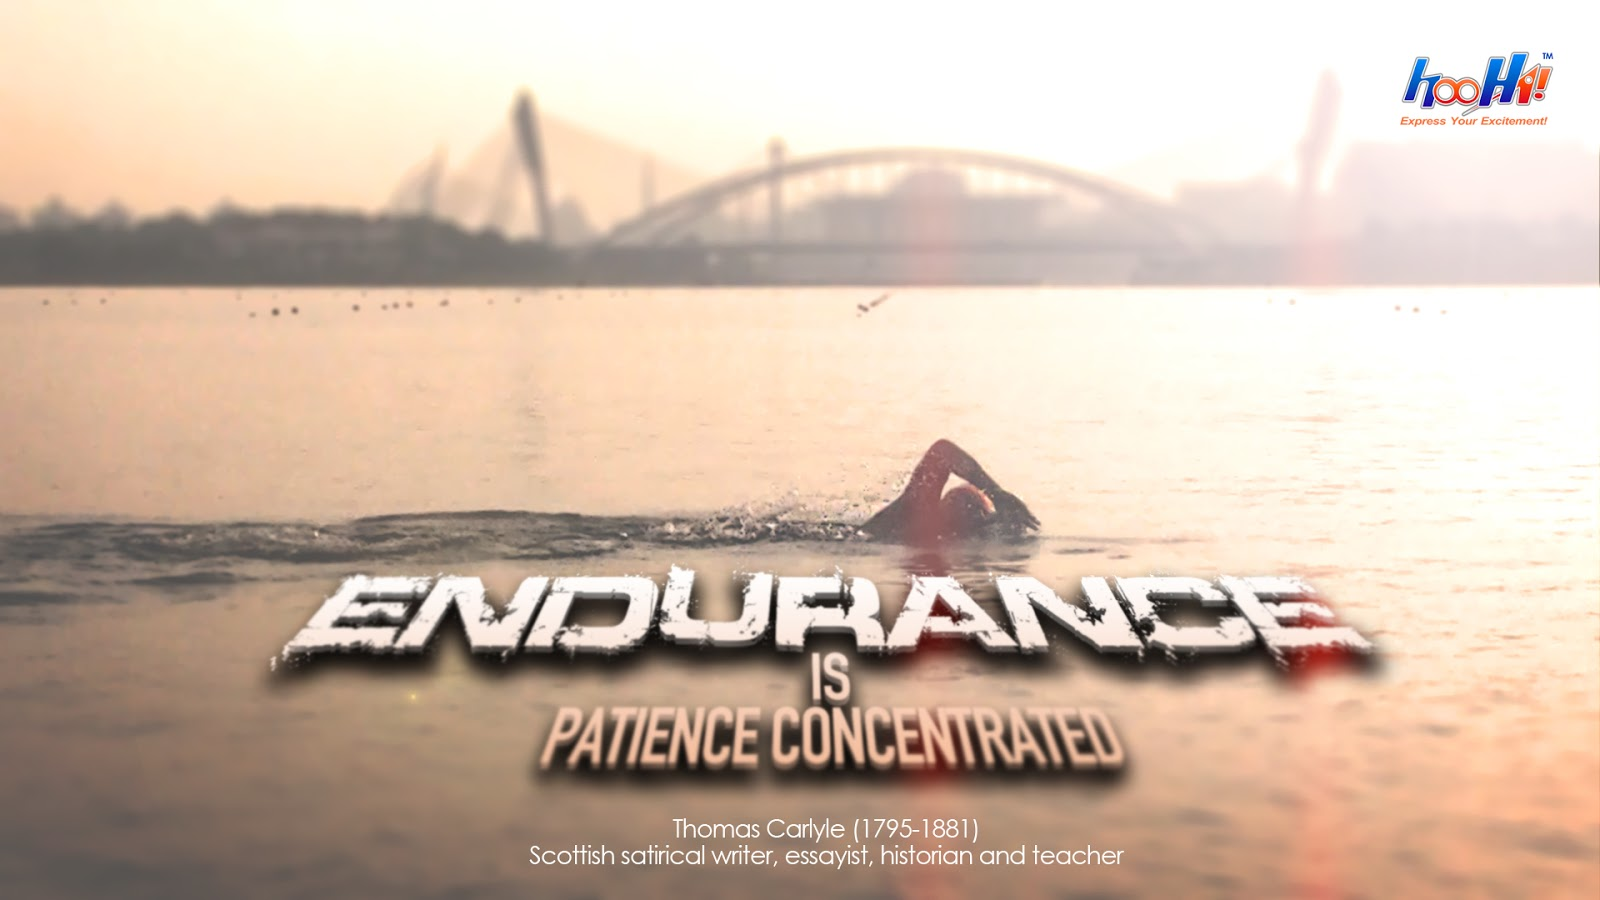 Endurance Quotes The Orangeman Says Motivational Quotes Wallpaper Download